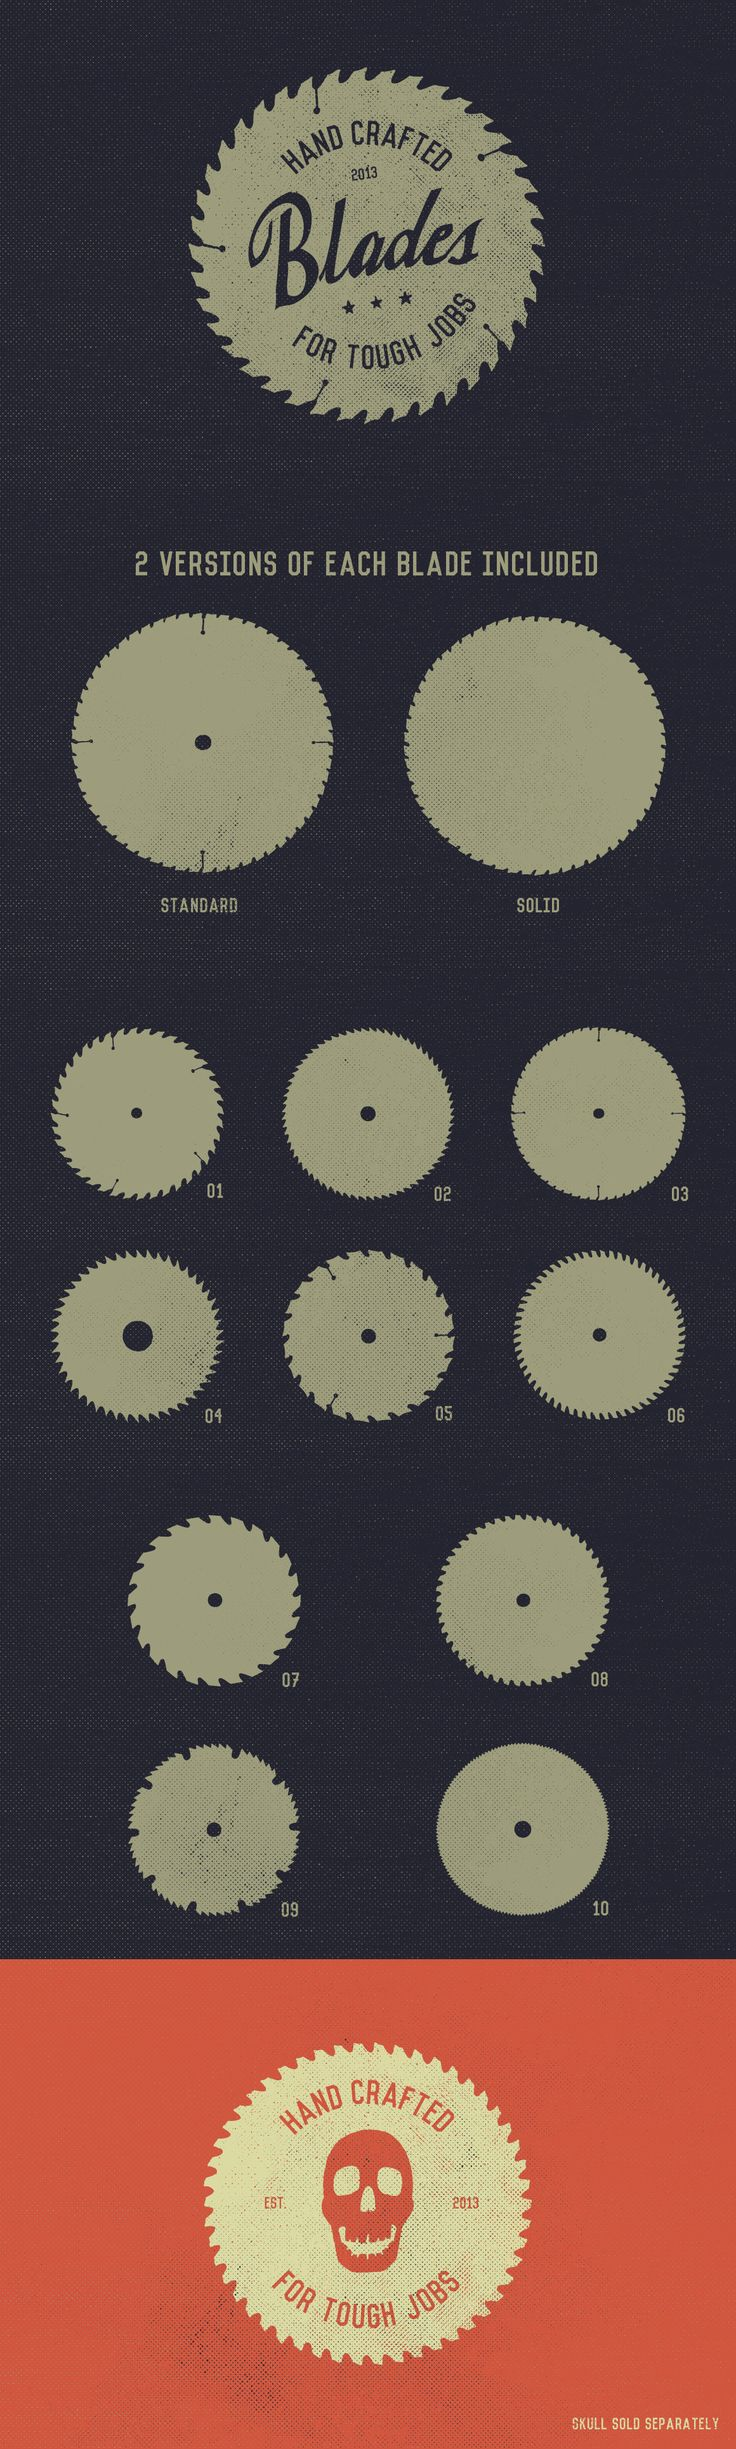 Badge Shapes - Circular Saw Blades Template #design Download: https://creativemarket.com/GhostlyPixels/15366-Badge-Shapes-Circular-Saw-Blades?u=ksioks